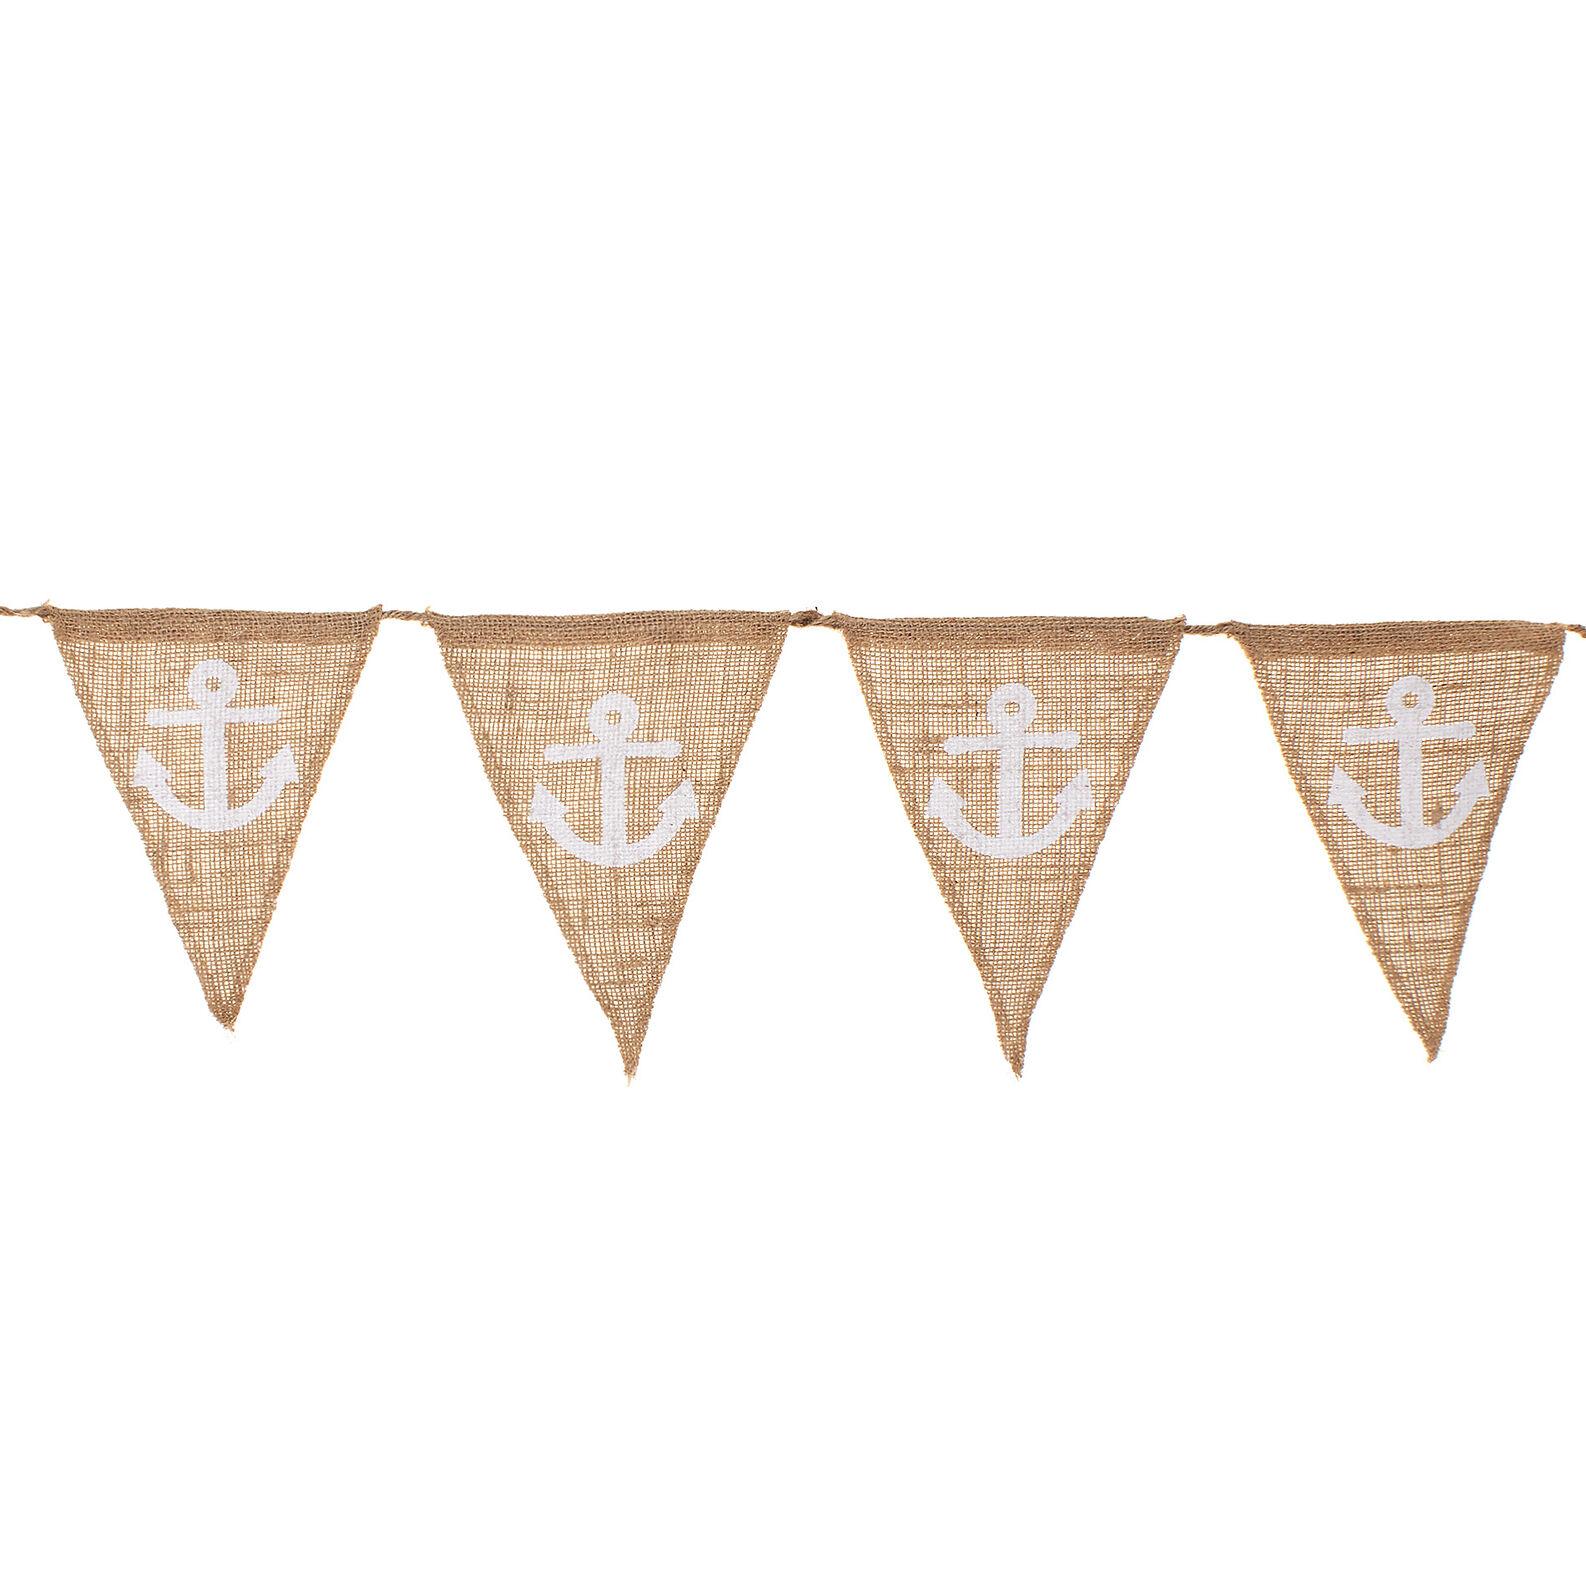 Small decorative jute flags